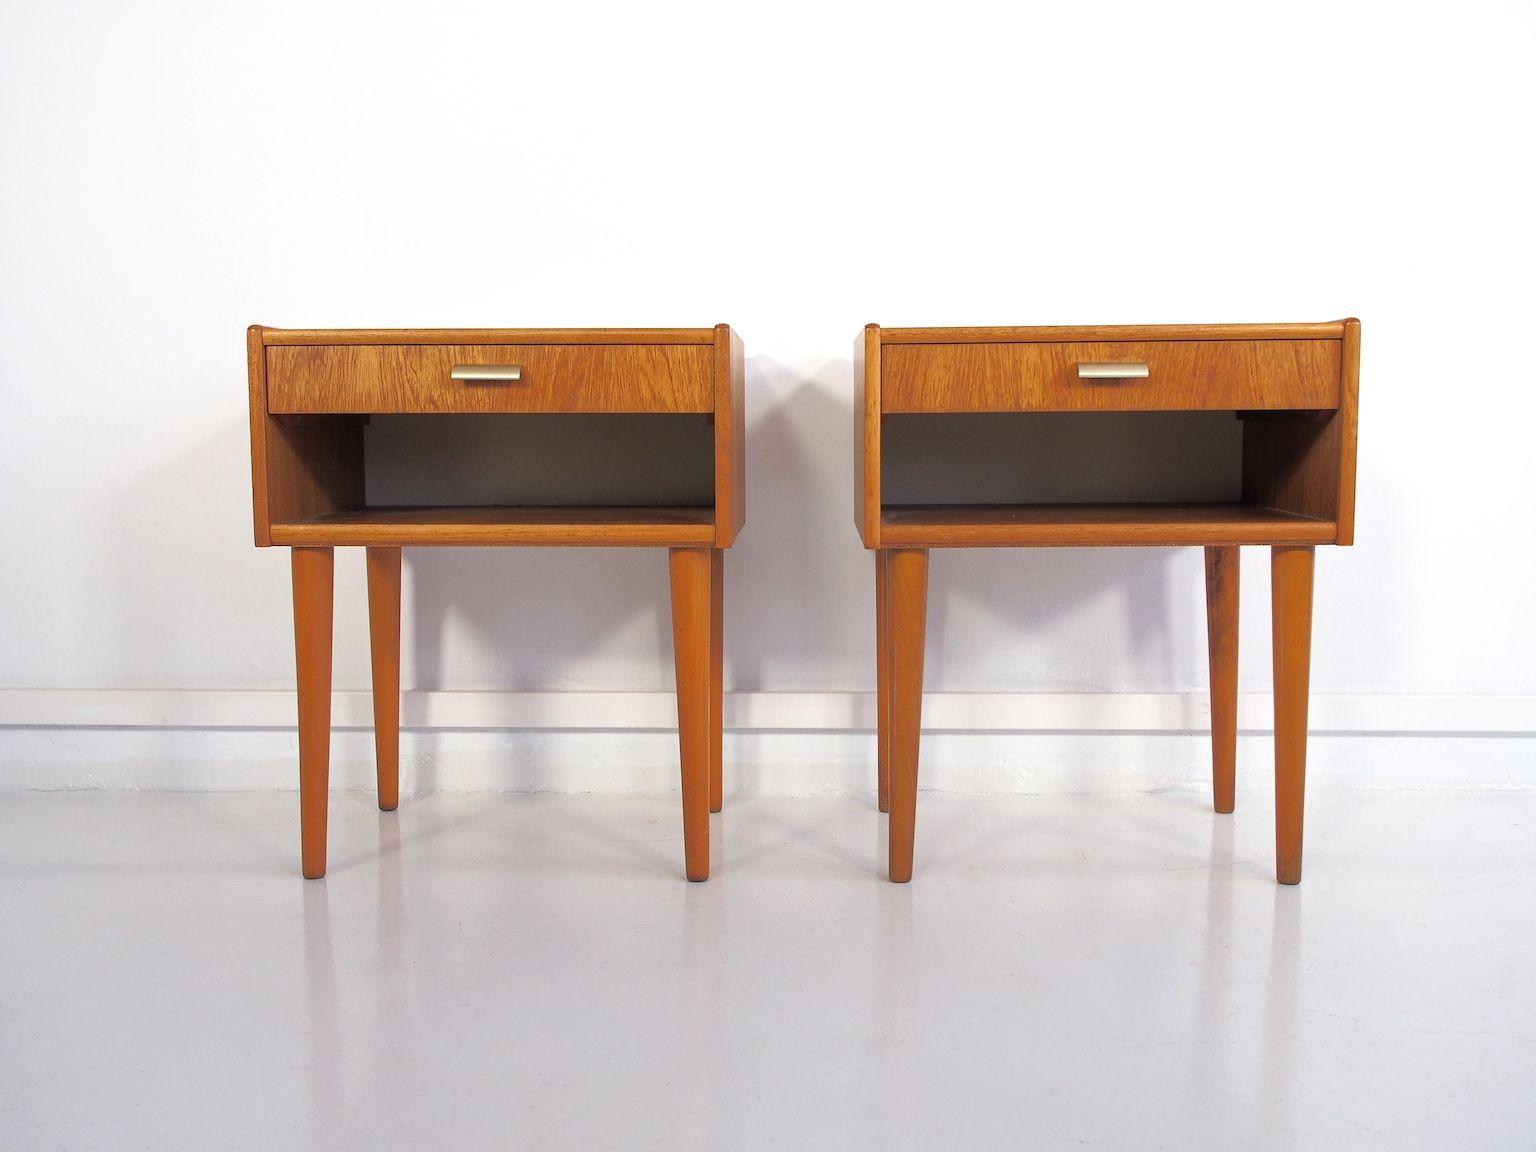 skandinavische moderne vintage teak nachttische 2er set. Black Bedroom Furniture Sets. Home Design Ideas